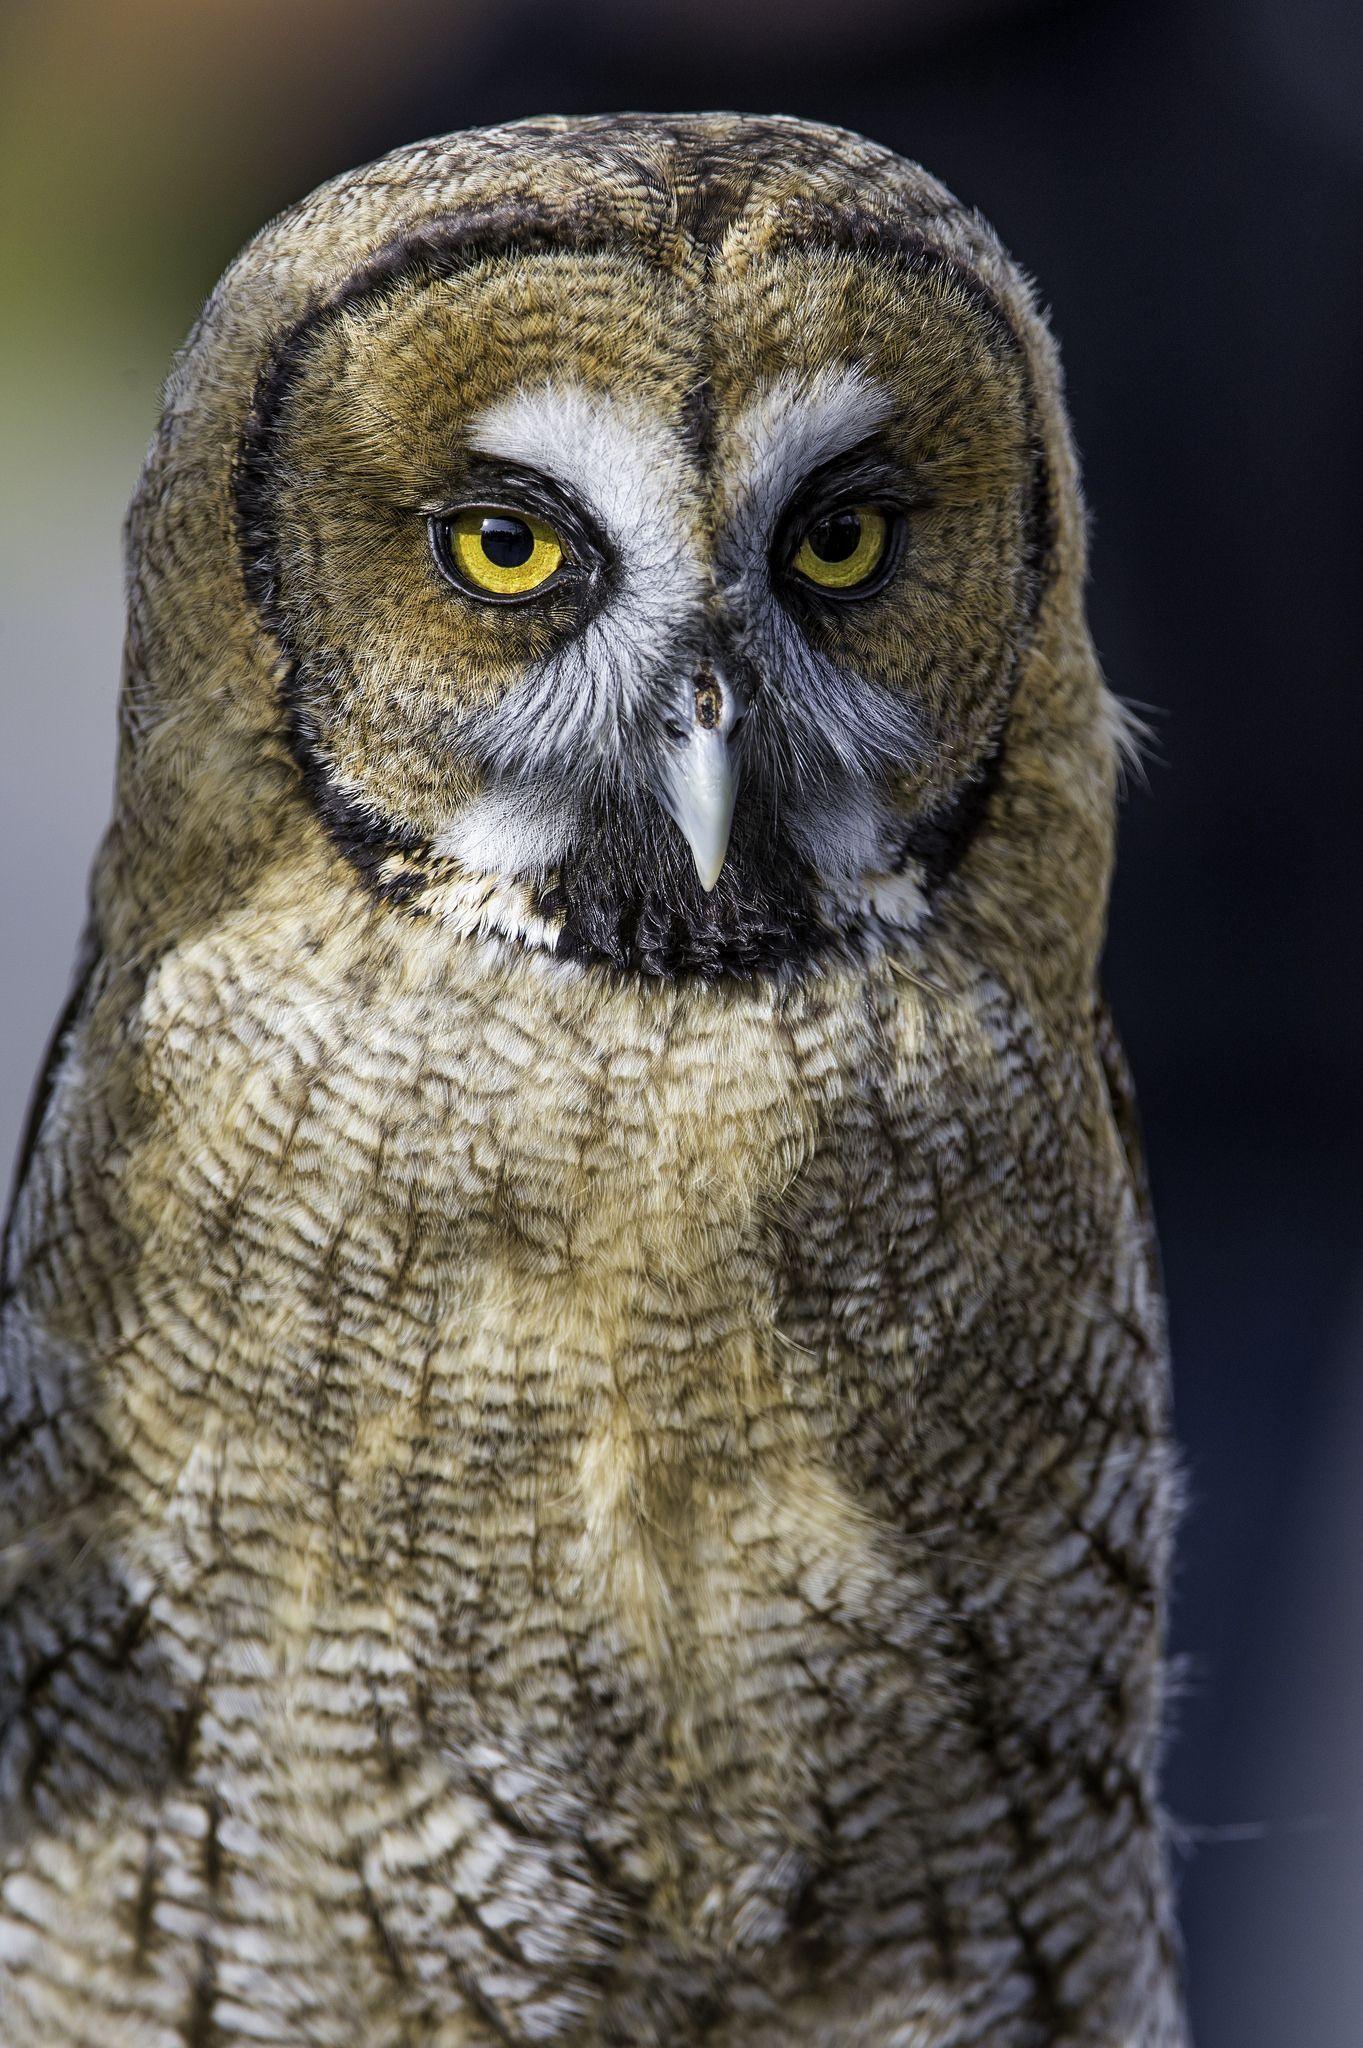 Httpsflickrpg8Fpzs - Hybrid Owl - This Is A Hybrid Between